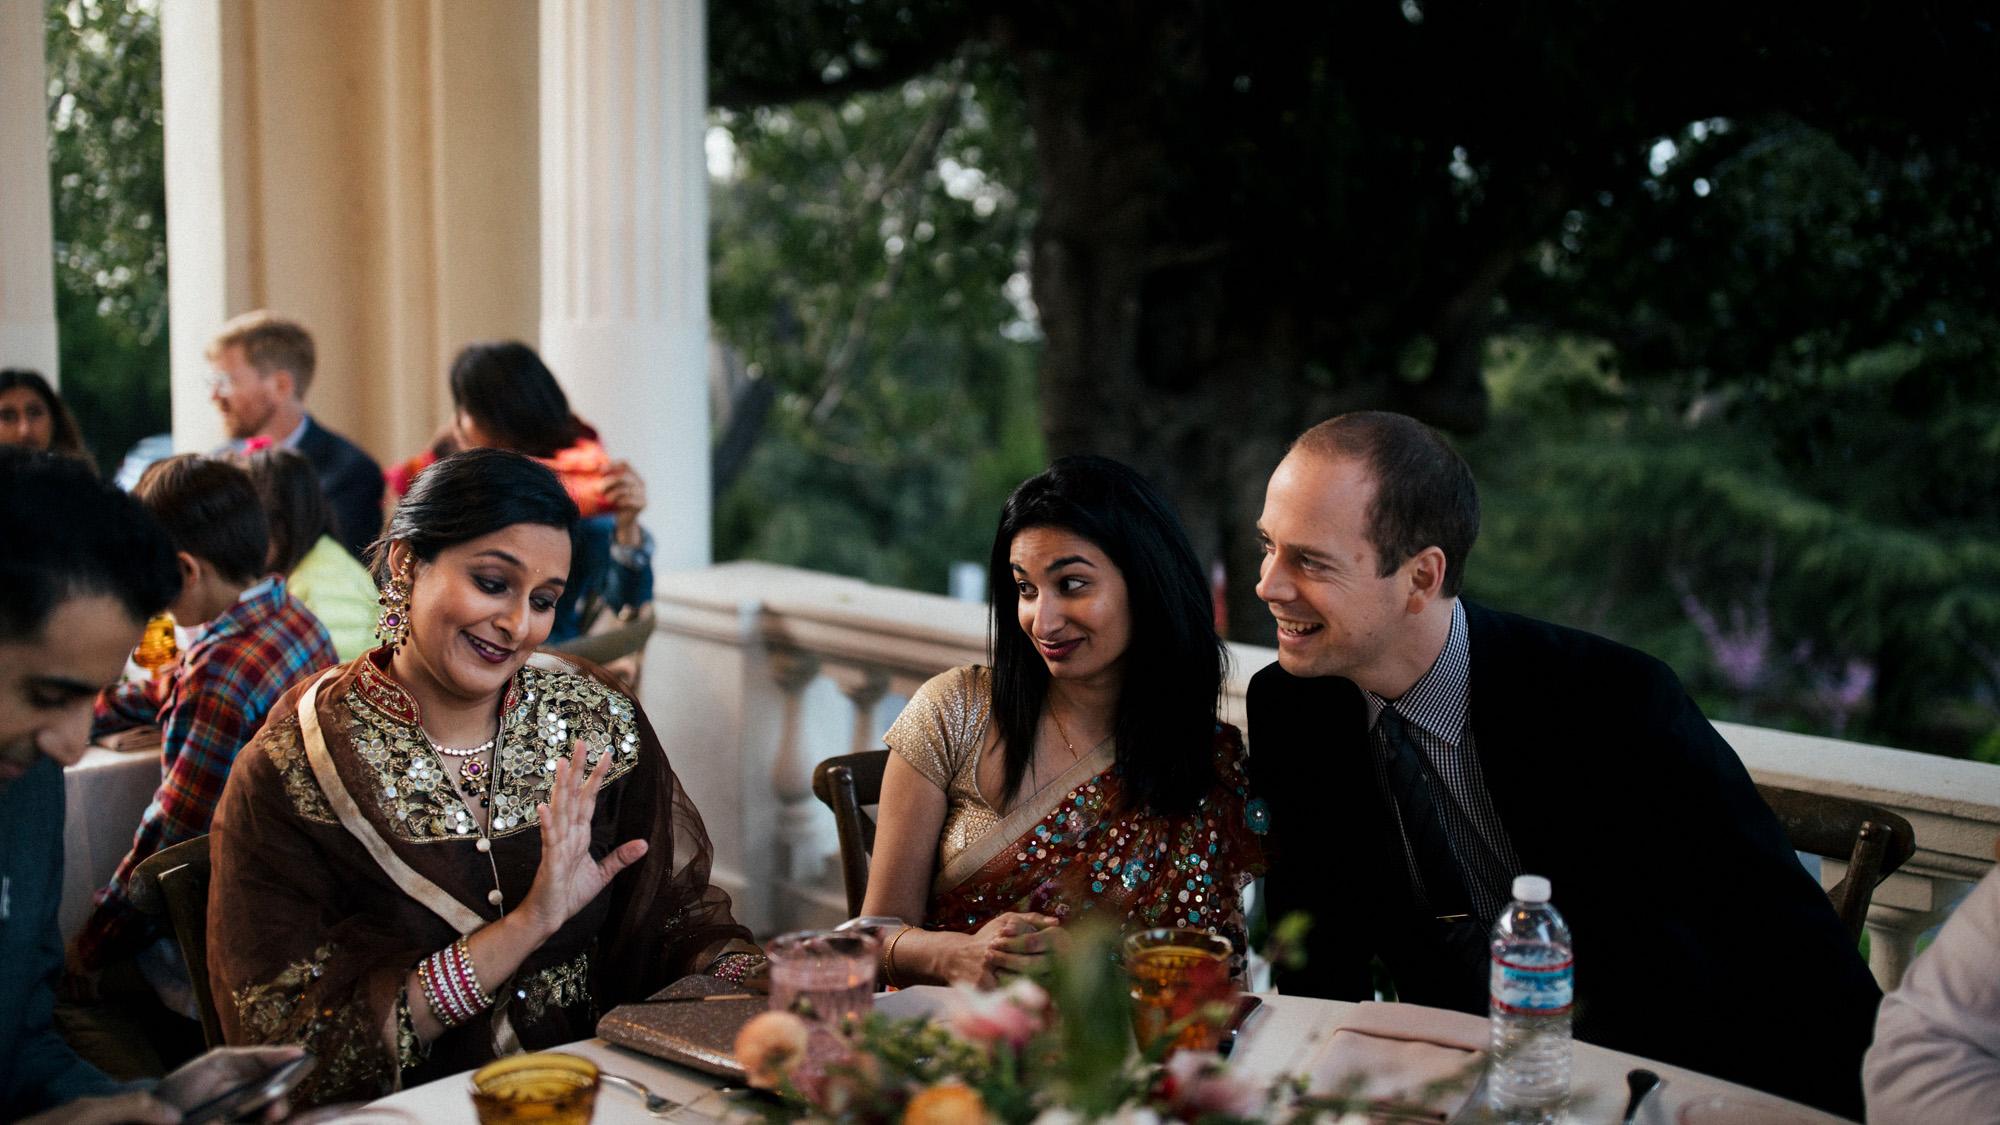 anu_maneesh_alec_vanderboom_Indian_wedding_photography-0163.jpg